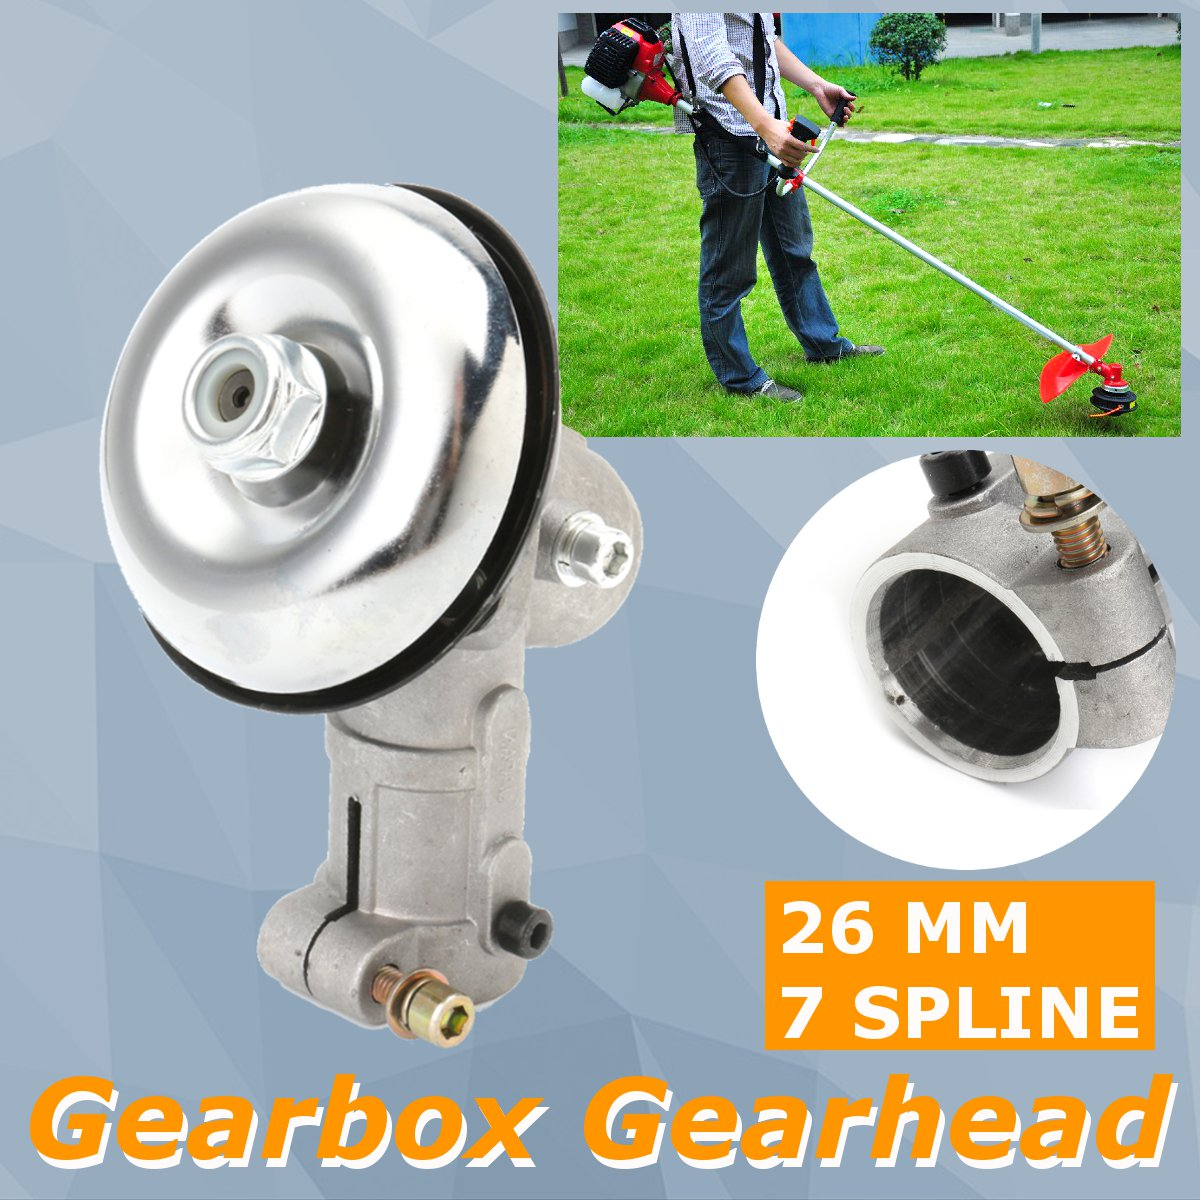 26mm 7 Spline Gearhead Gearbox For Trimmer Strimmer Brush Cutter Lawn Mower Fit Various Strimmer Trimmer Brush Cutter